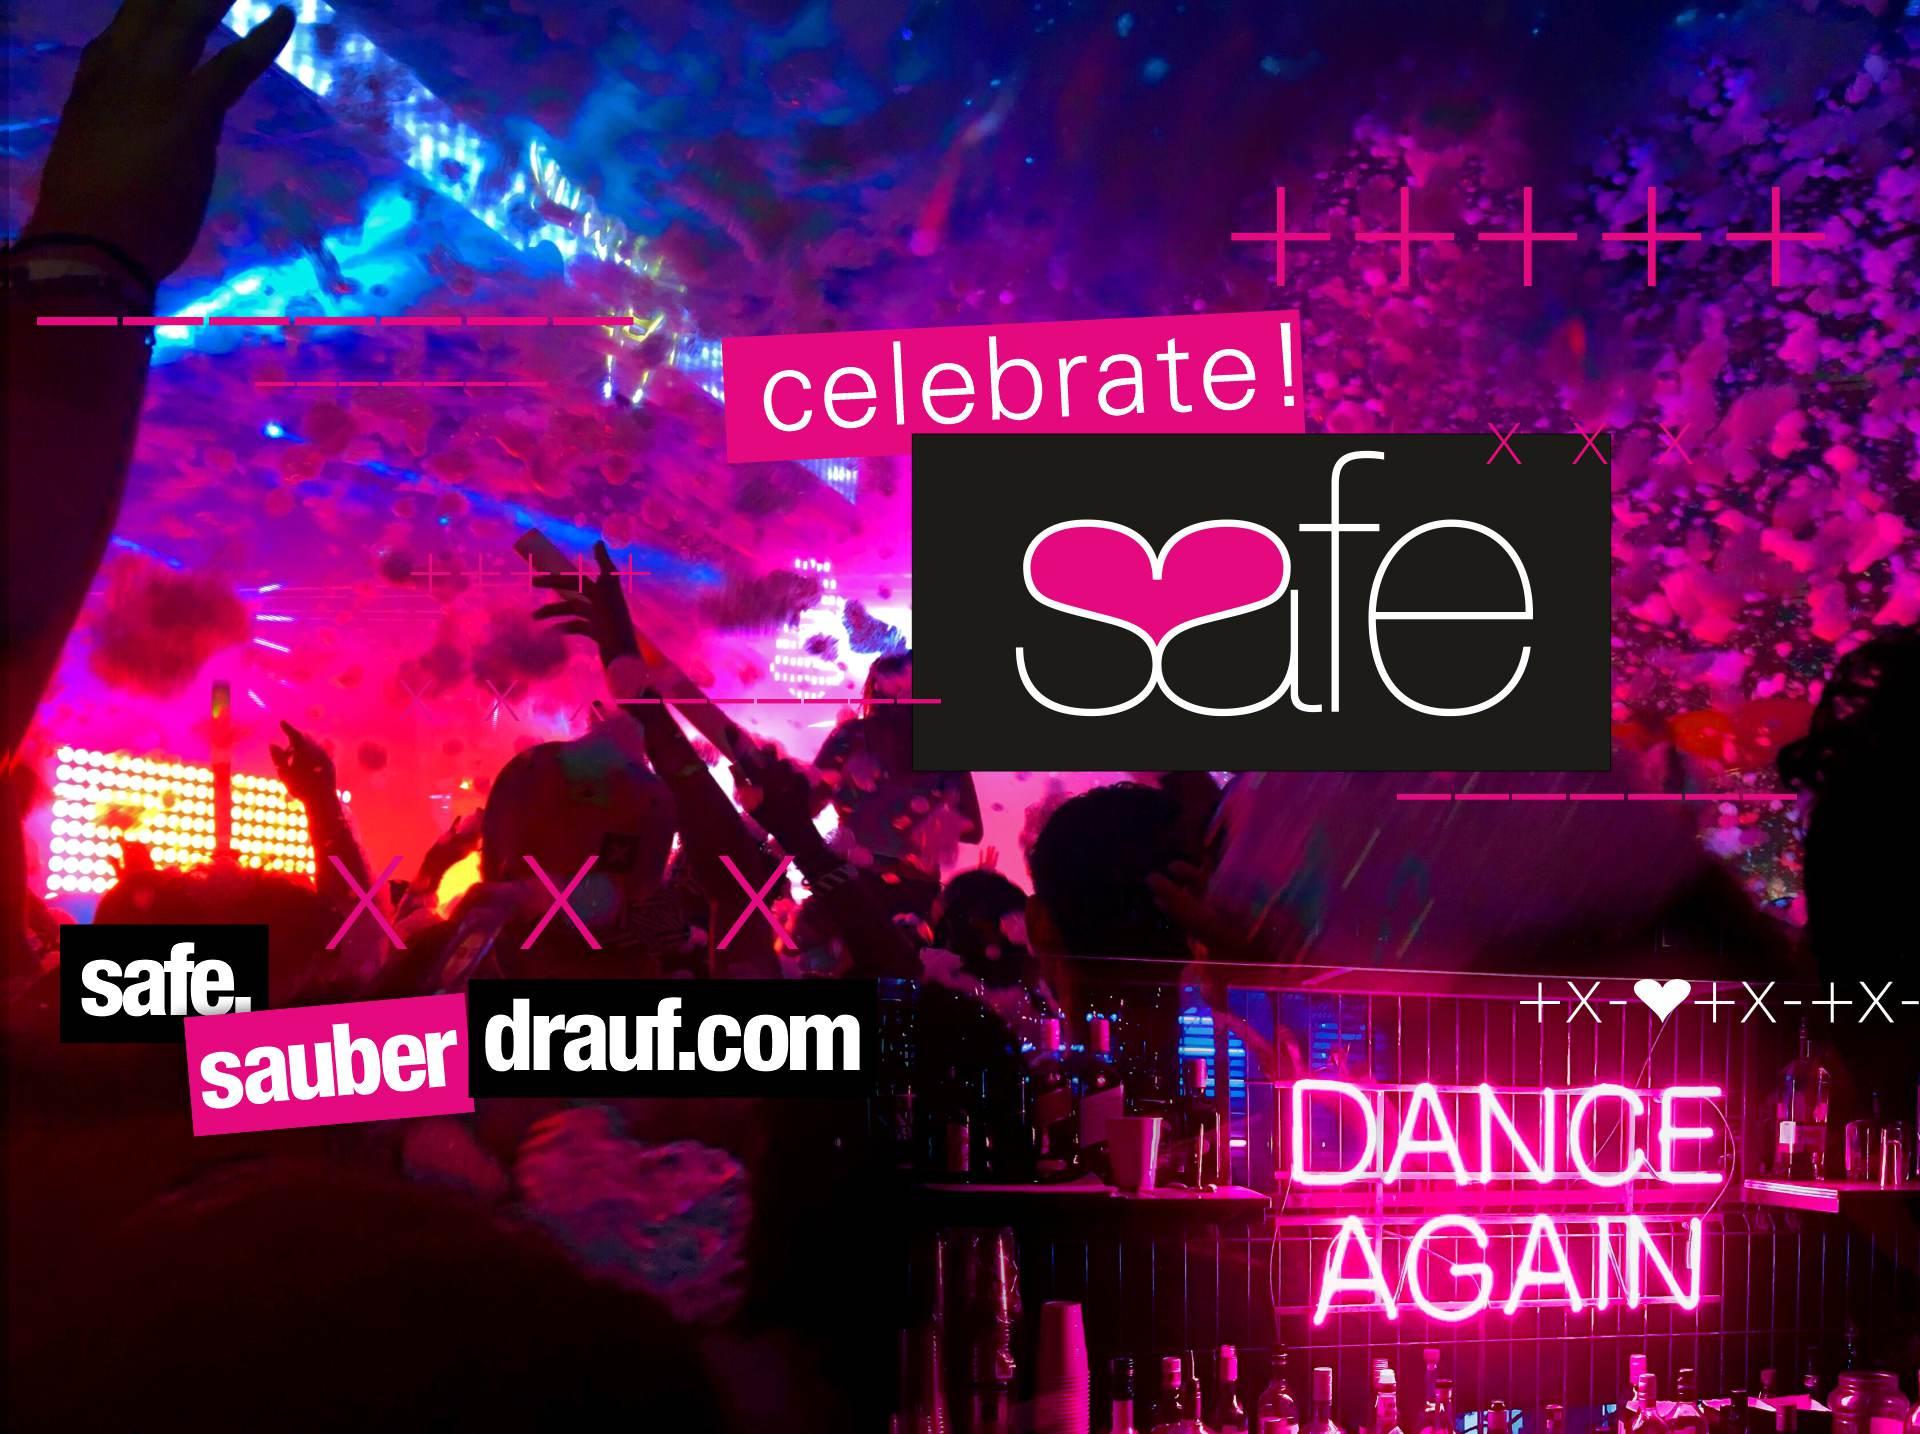 ReFeiern - sauber feiern - Safer Use Banners -celecbrate safe - safer use - BANNER 1 - 1920px